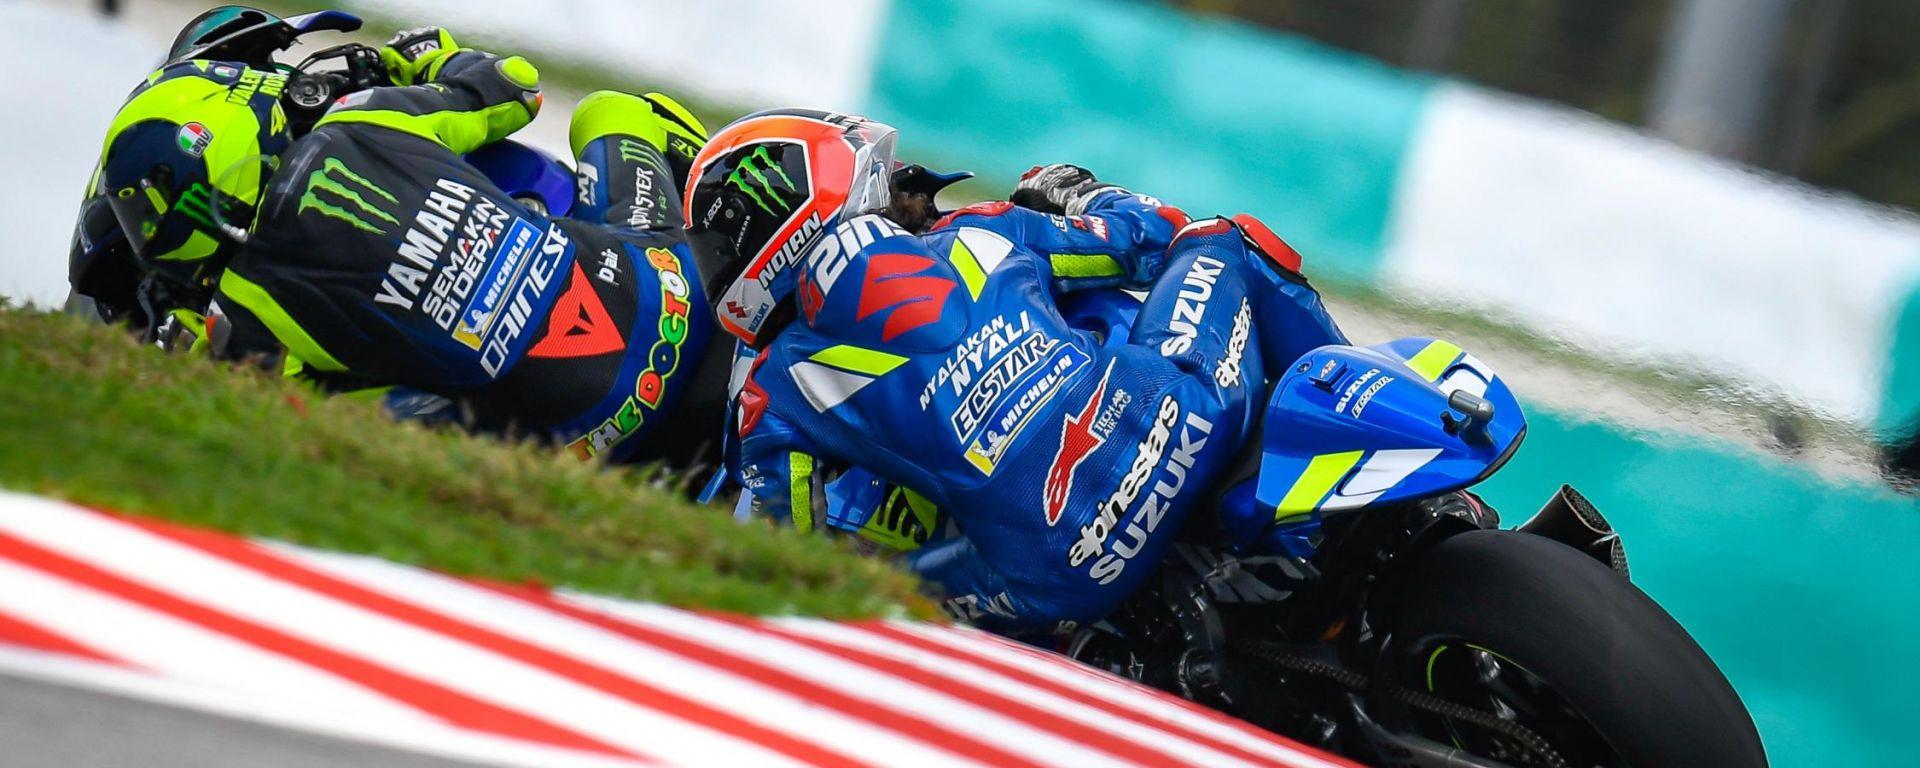 MotoGP Malesia 2019, Sepang: Valentino Rossi (Yamaha) e Alex Rins (Suzuki)